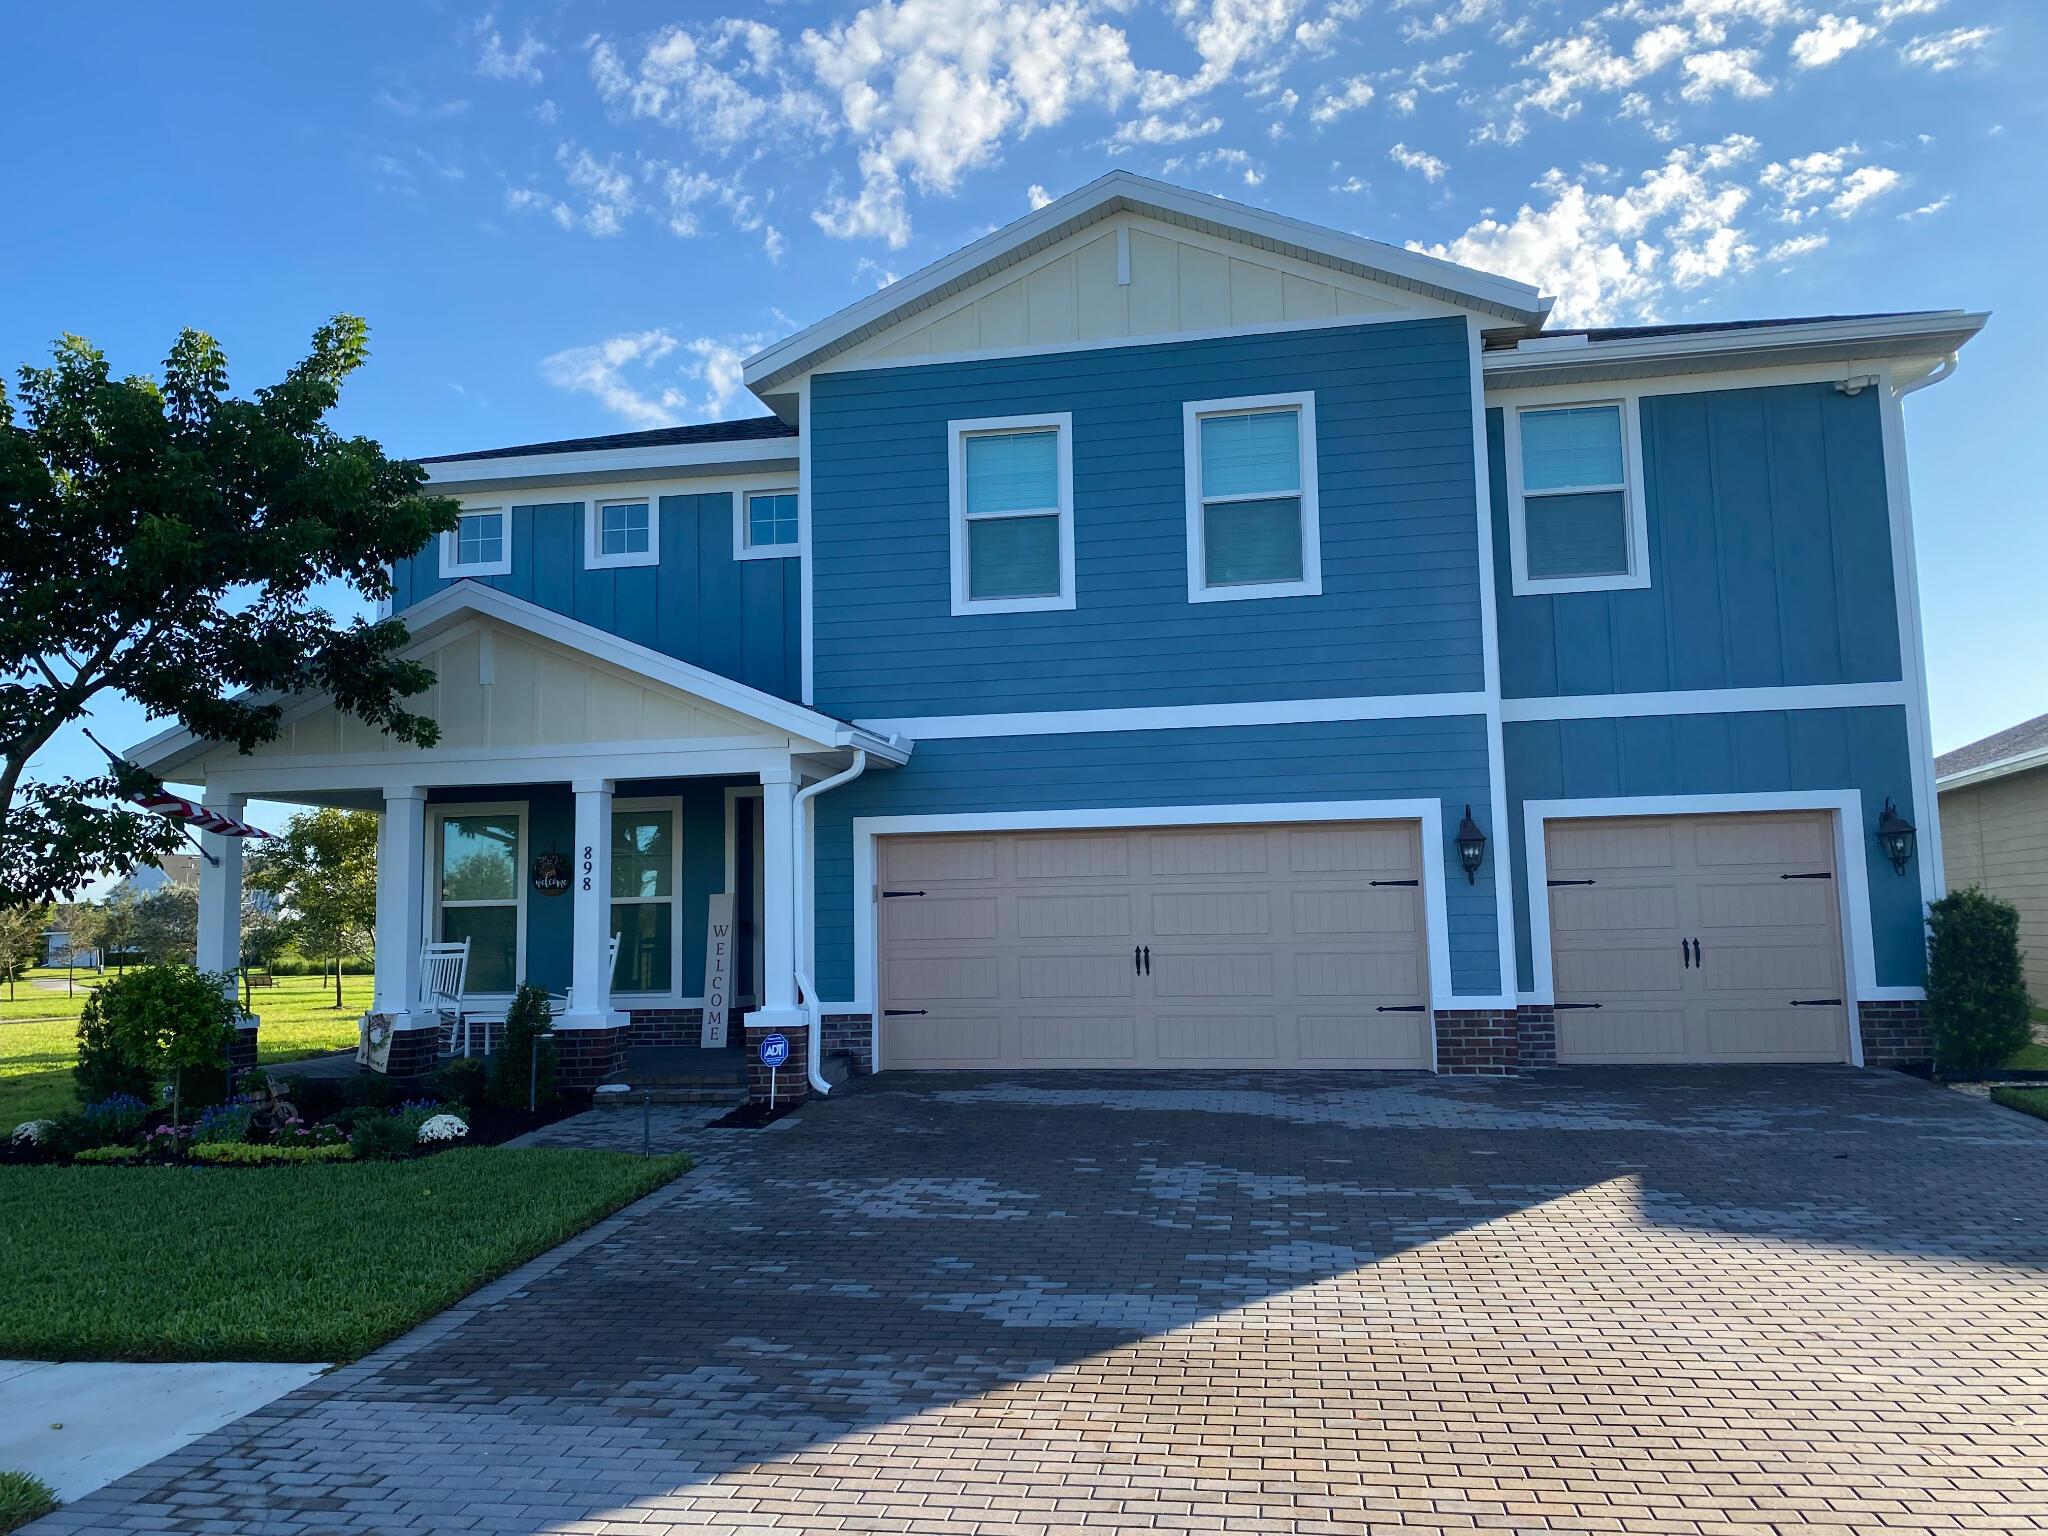 890 Sweetgrass Street - 33470 - FL - Loxahatchee